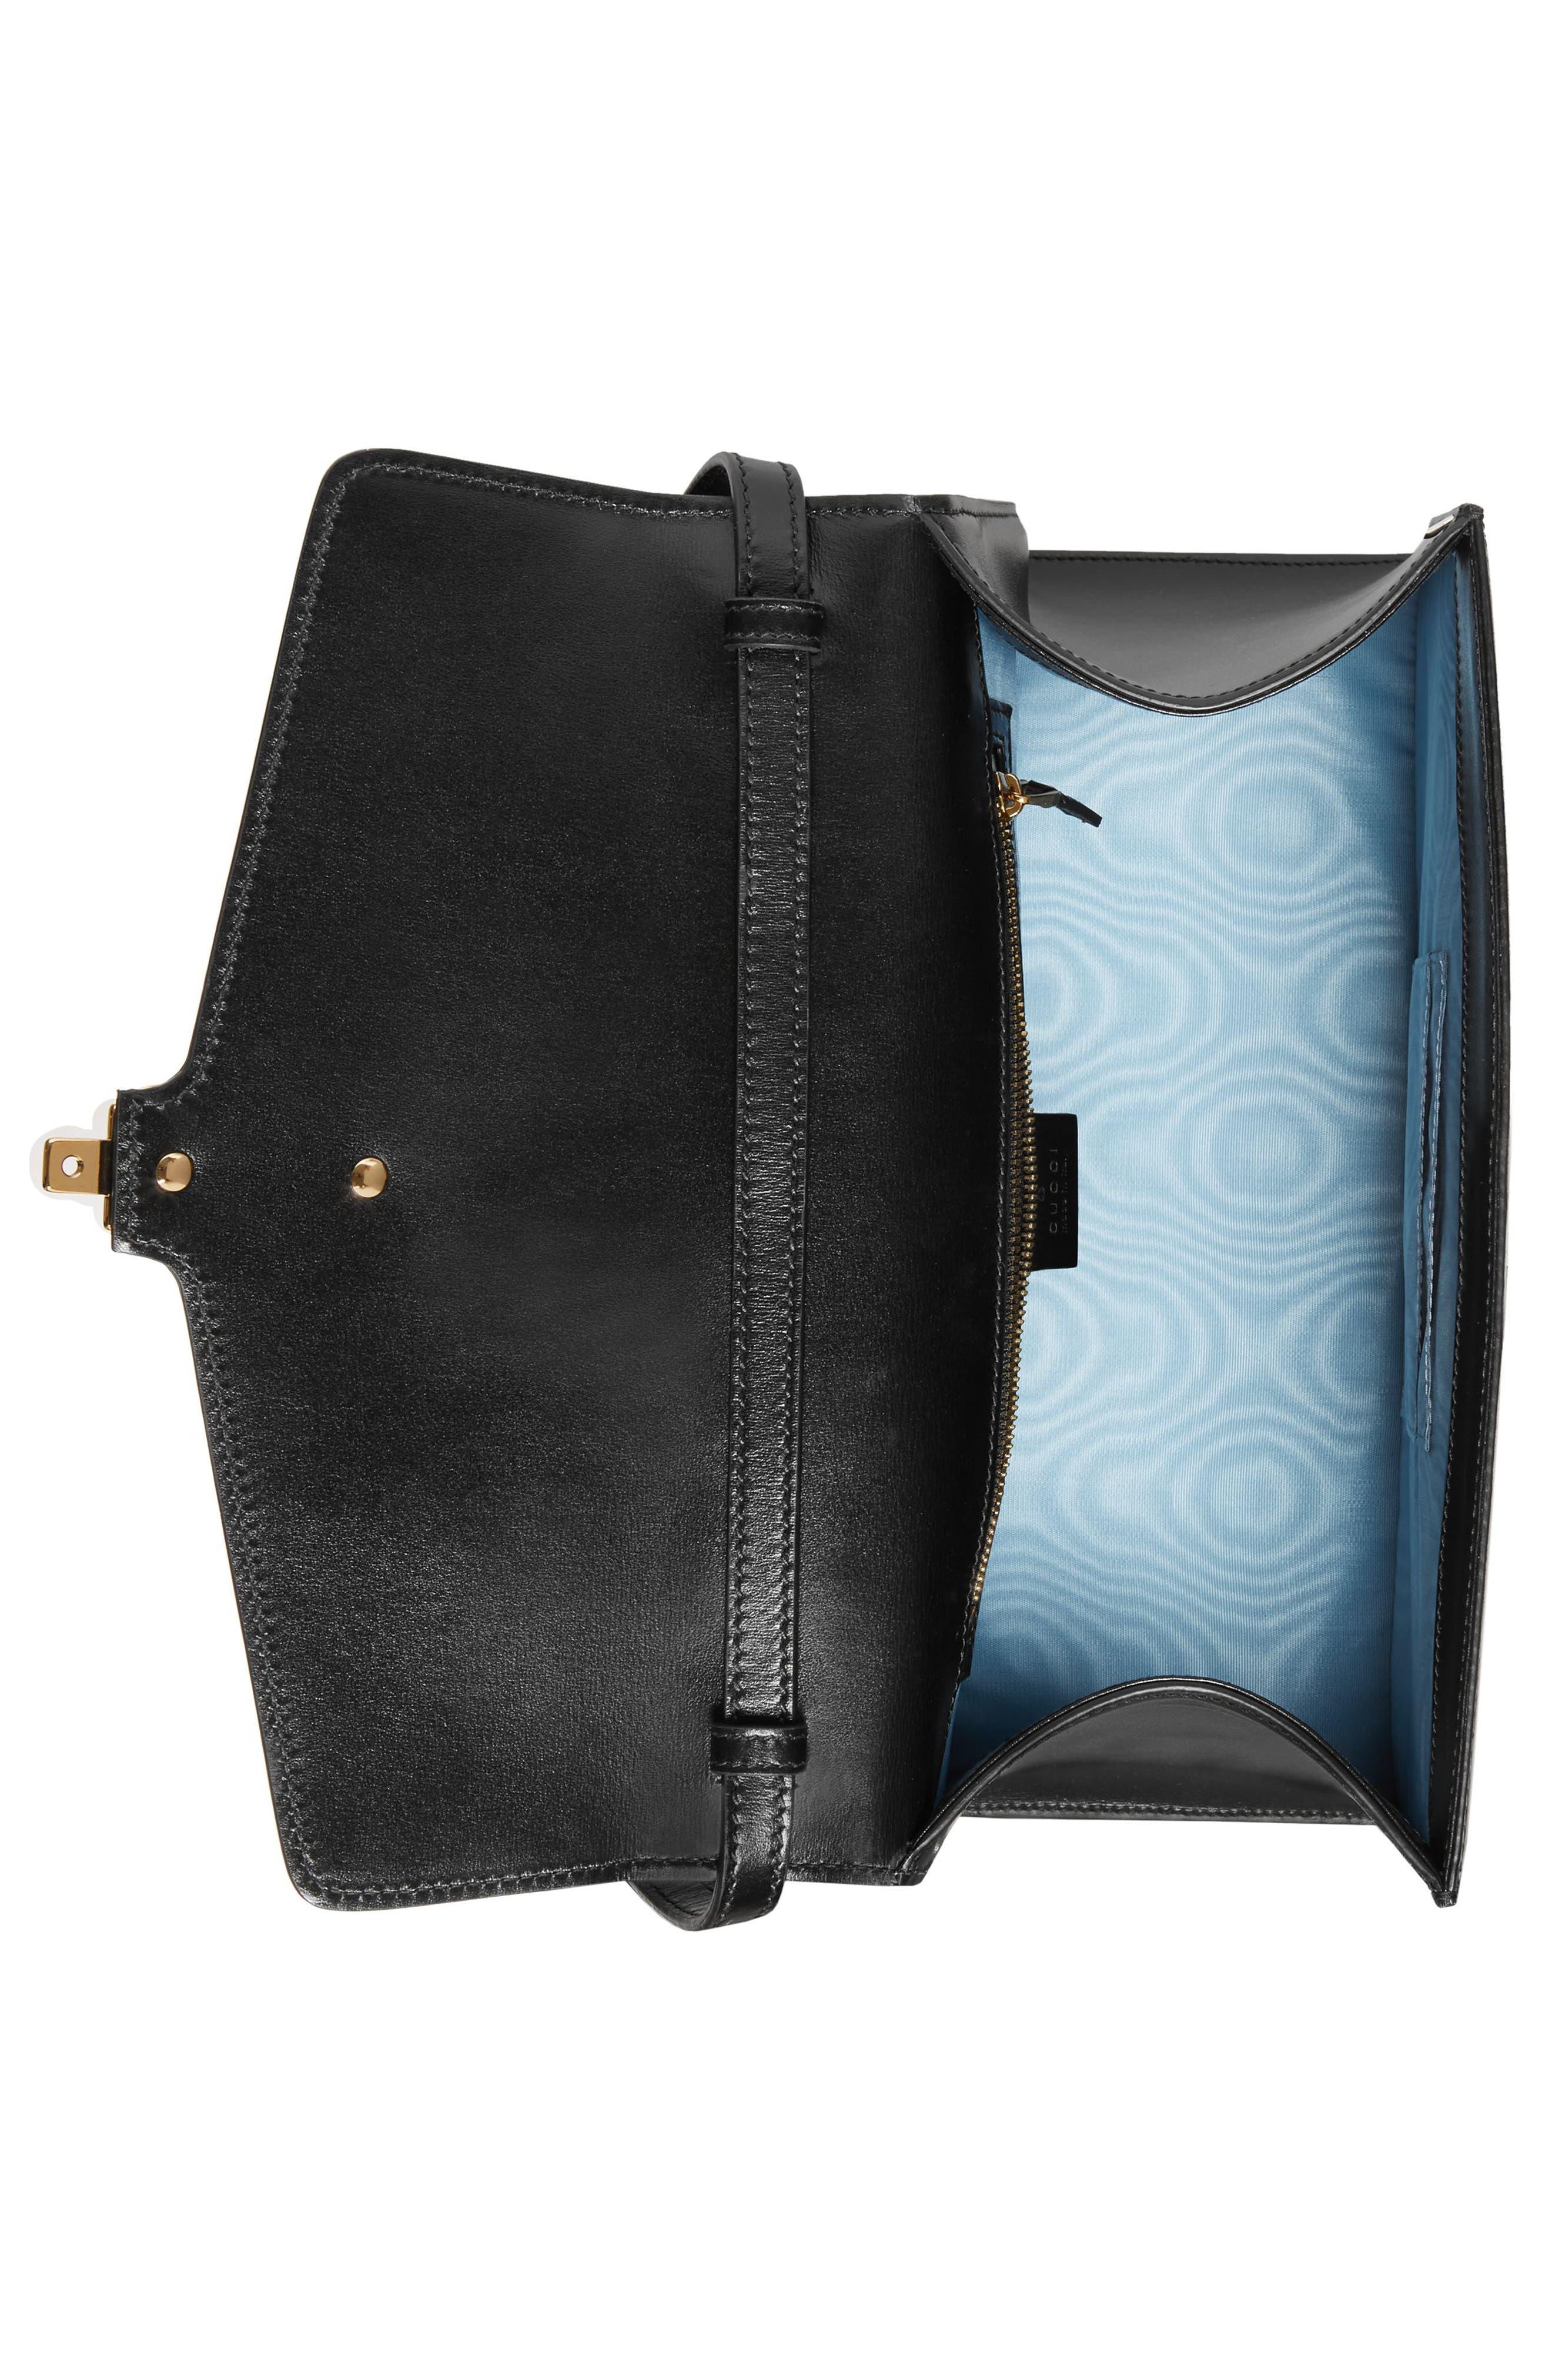 Medium Sylvie Top Handle Leather Bag,                             Alternate thumbnail 3, color,                             BLACK GOLD/ CARAMEL/ OCHRE